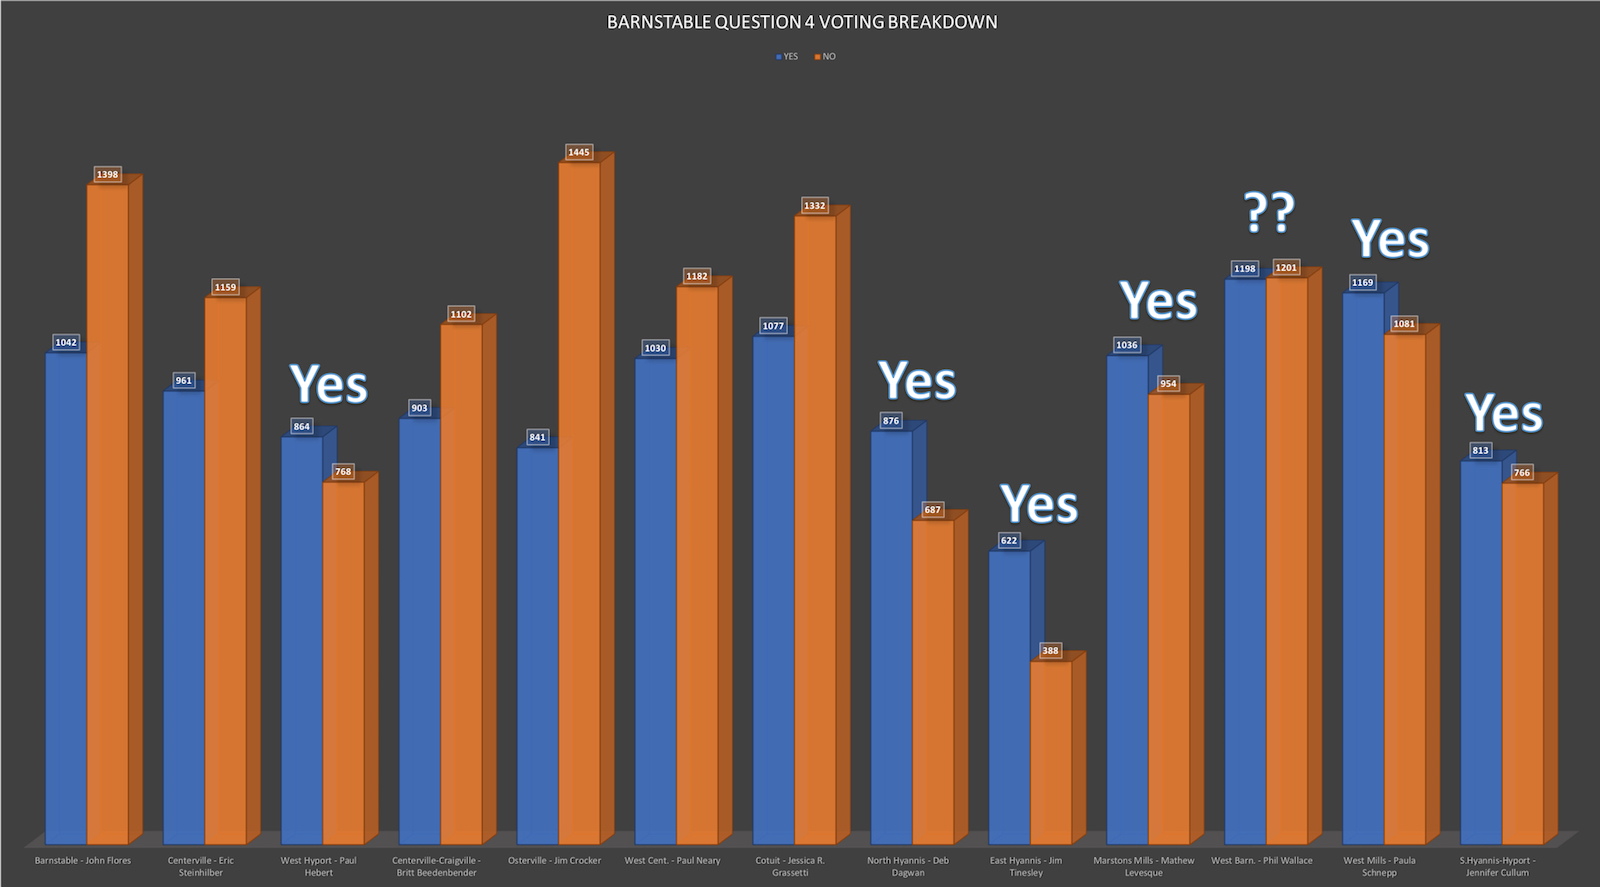 Barnstable Cape Cod Cannabis Question 4 Voting Breakdown Small.jpg